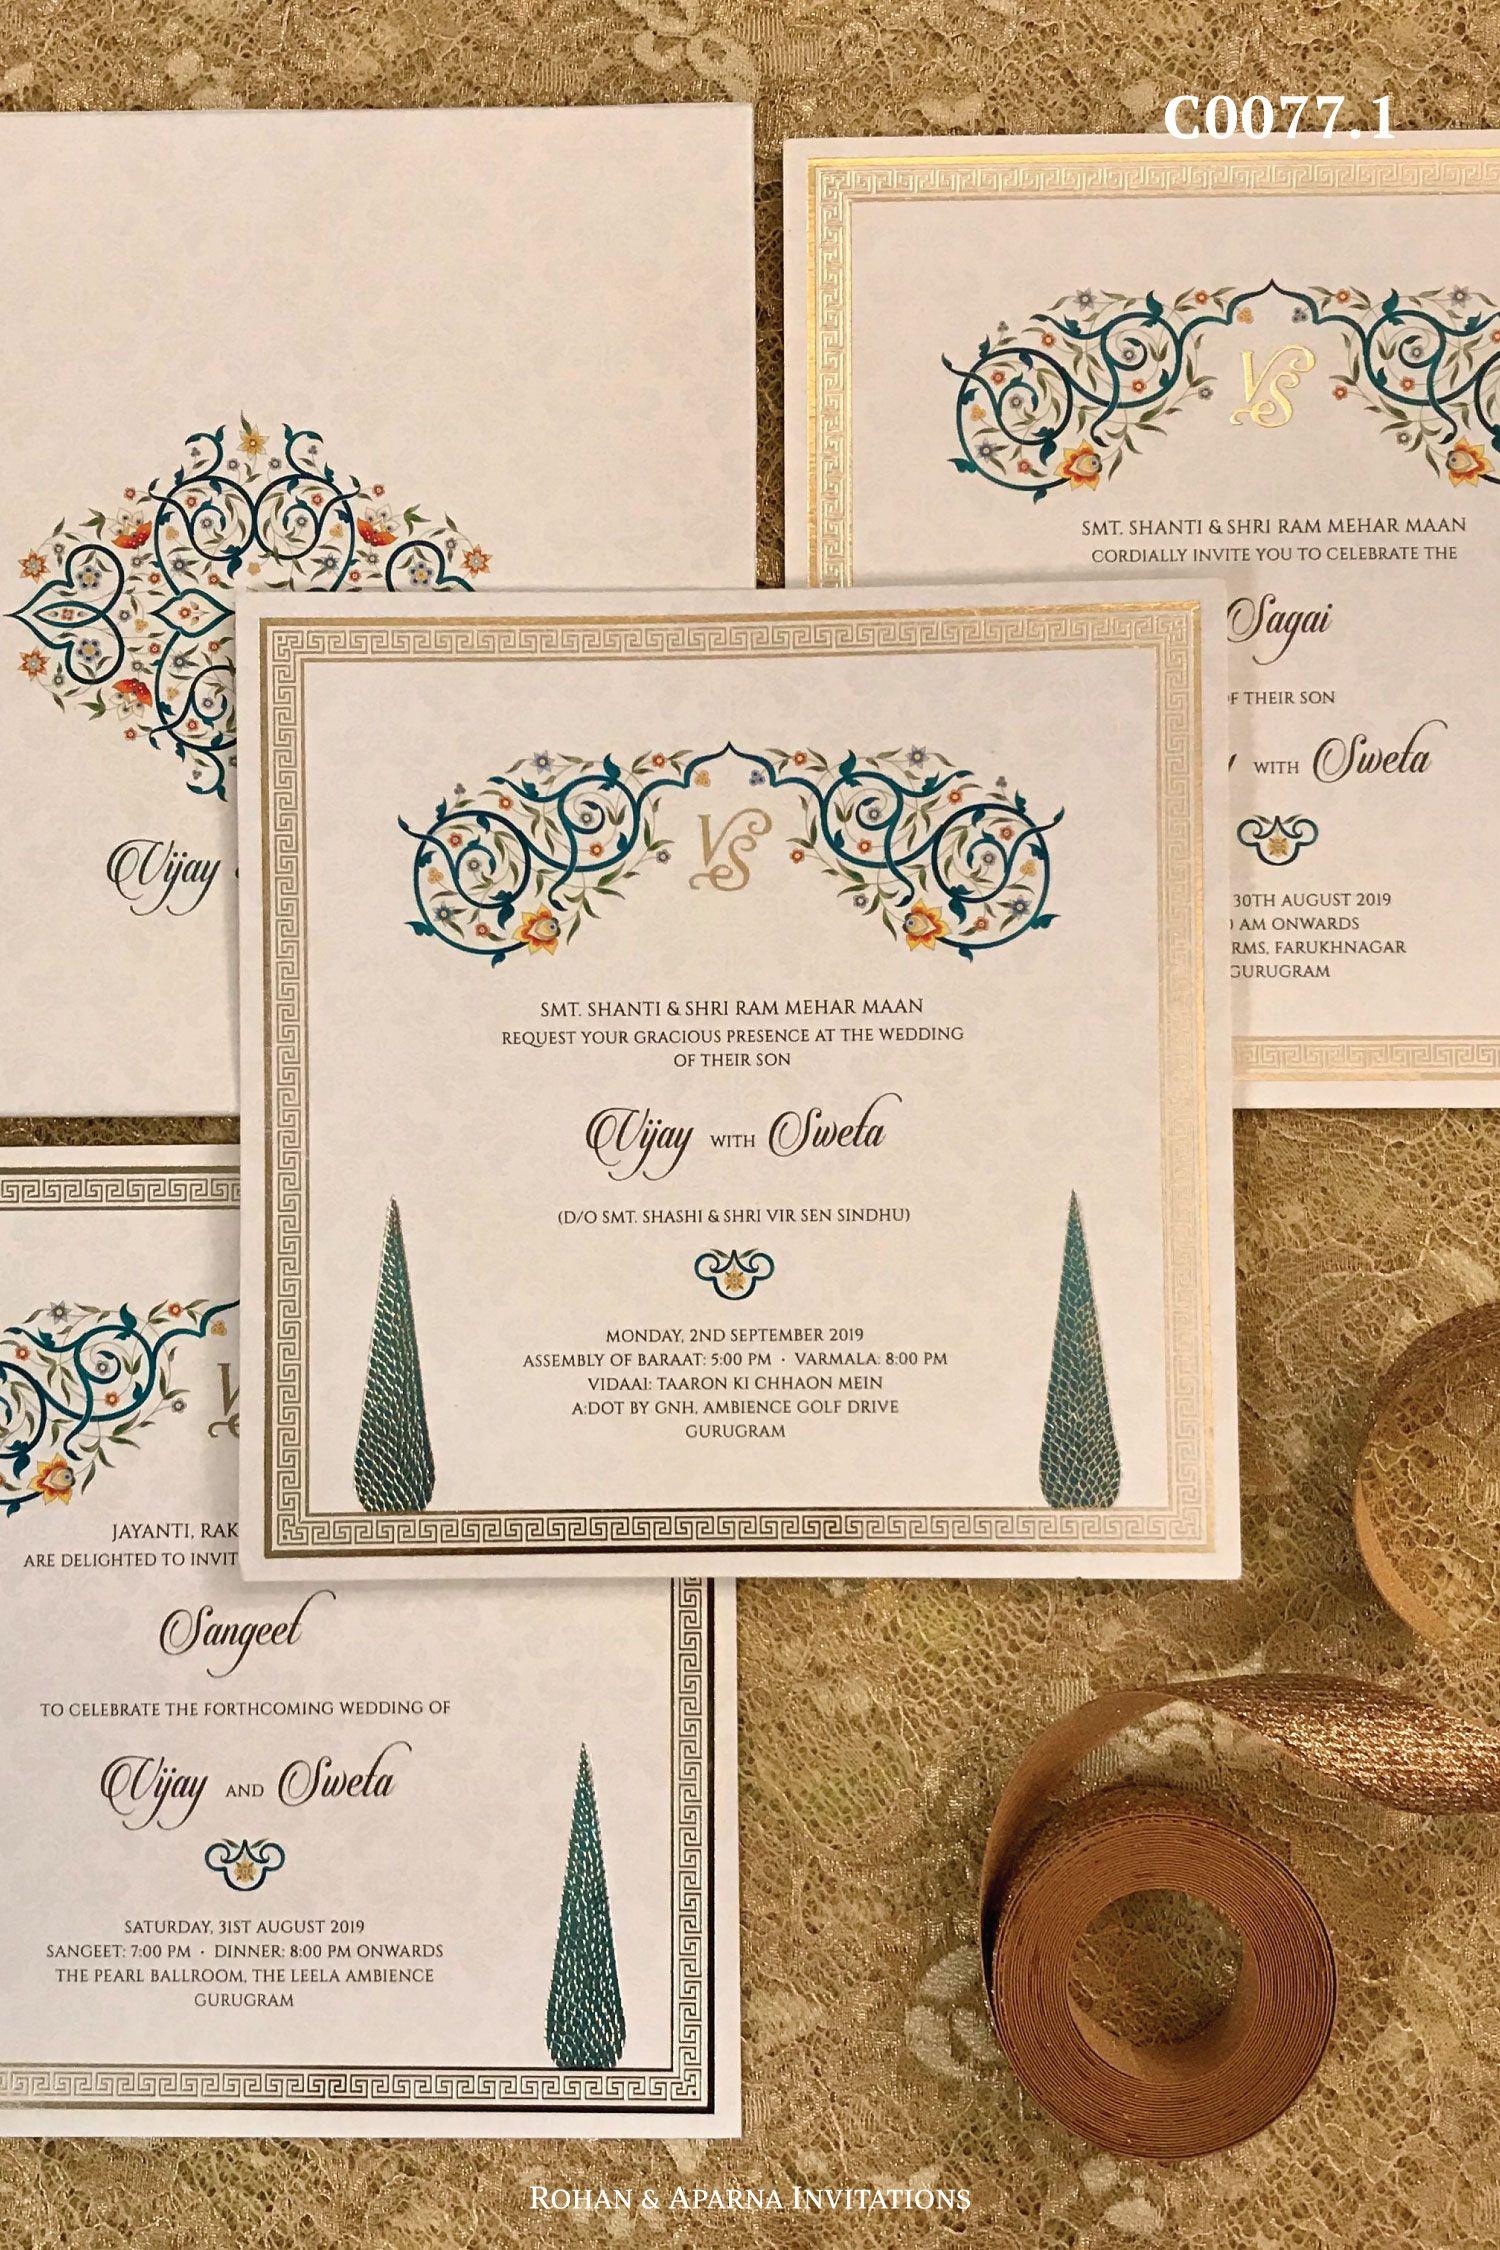 Pin by Rohan & Aparna Invitations on Invitation cards | Indian wedding  invitation cards, Digital invitations wedding, Fun wedding invitations